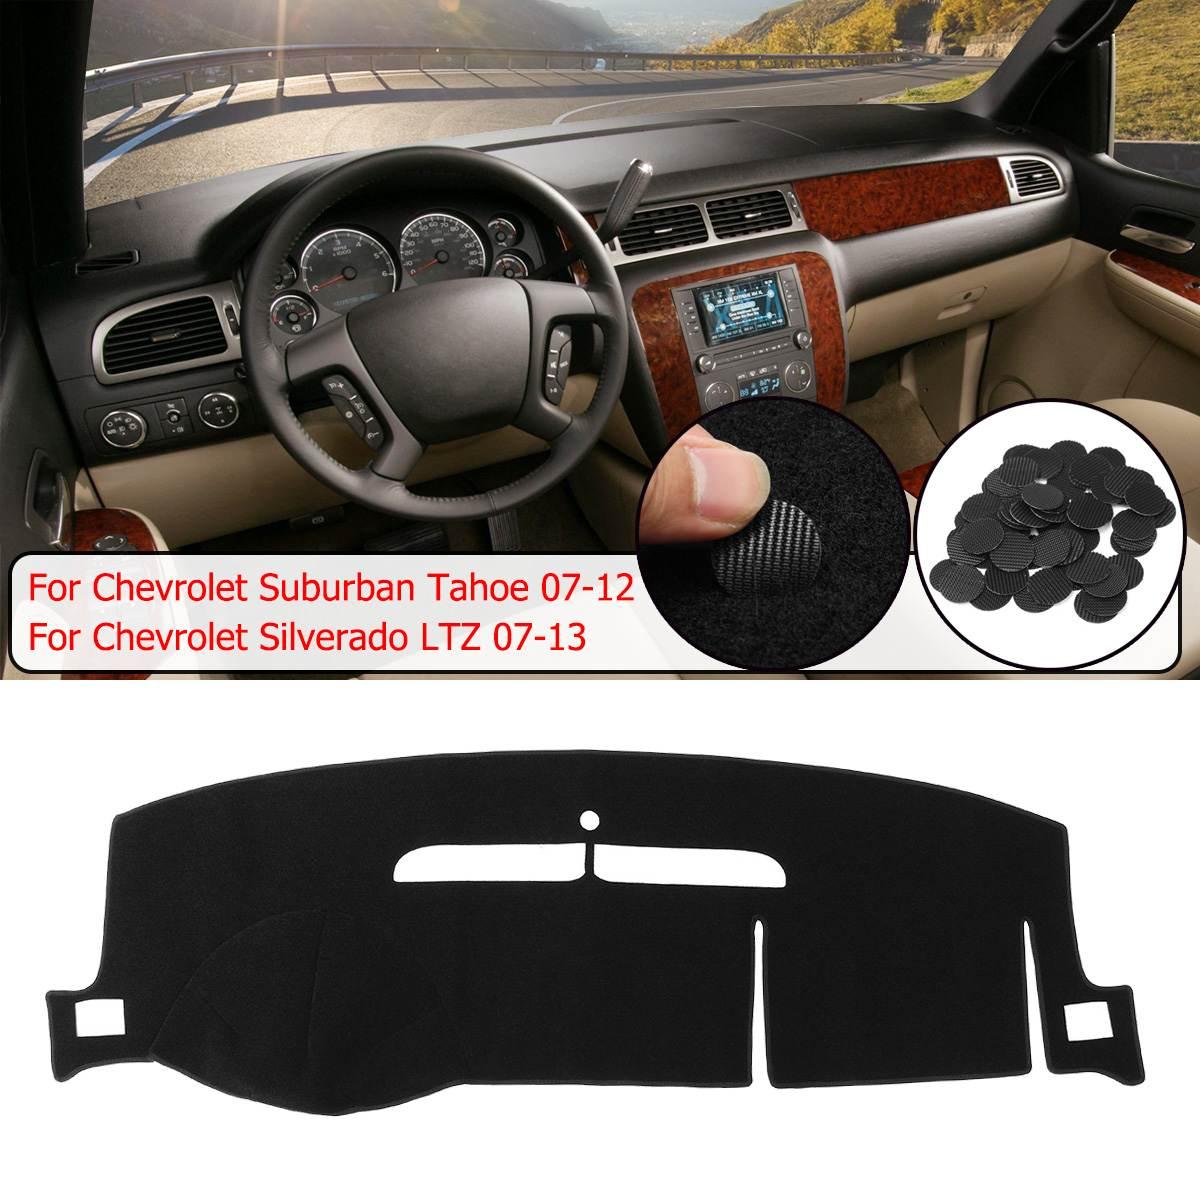 Dash Cover Dashboard Cover Mat Pad Fit for Chevy Chevrolet Tahoe 2007-2014,GMC Yukon 2007-2014,Chevy Avalanche Silverado 1500 LTZ 2007-2013 Black